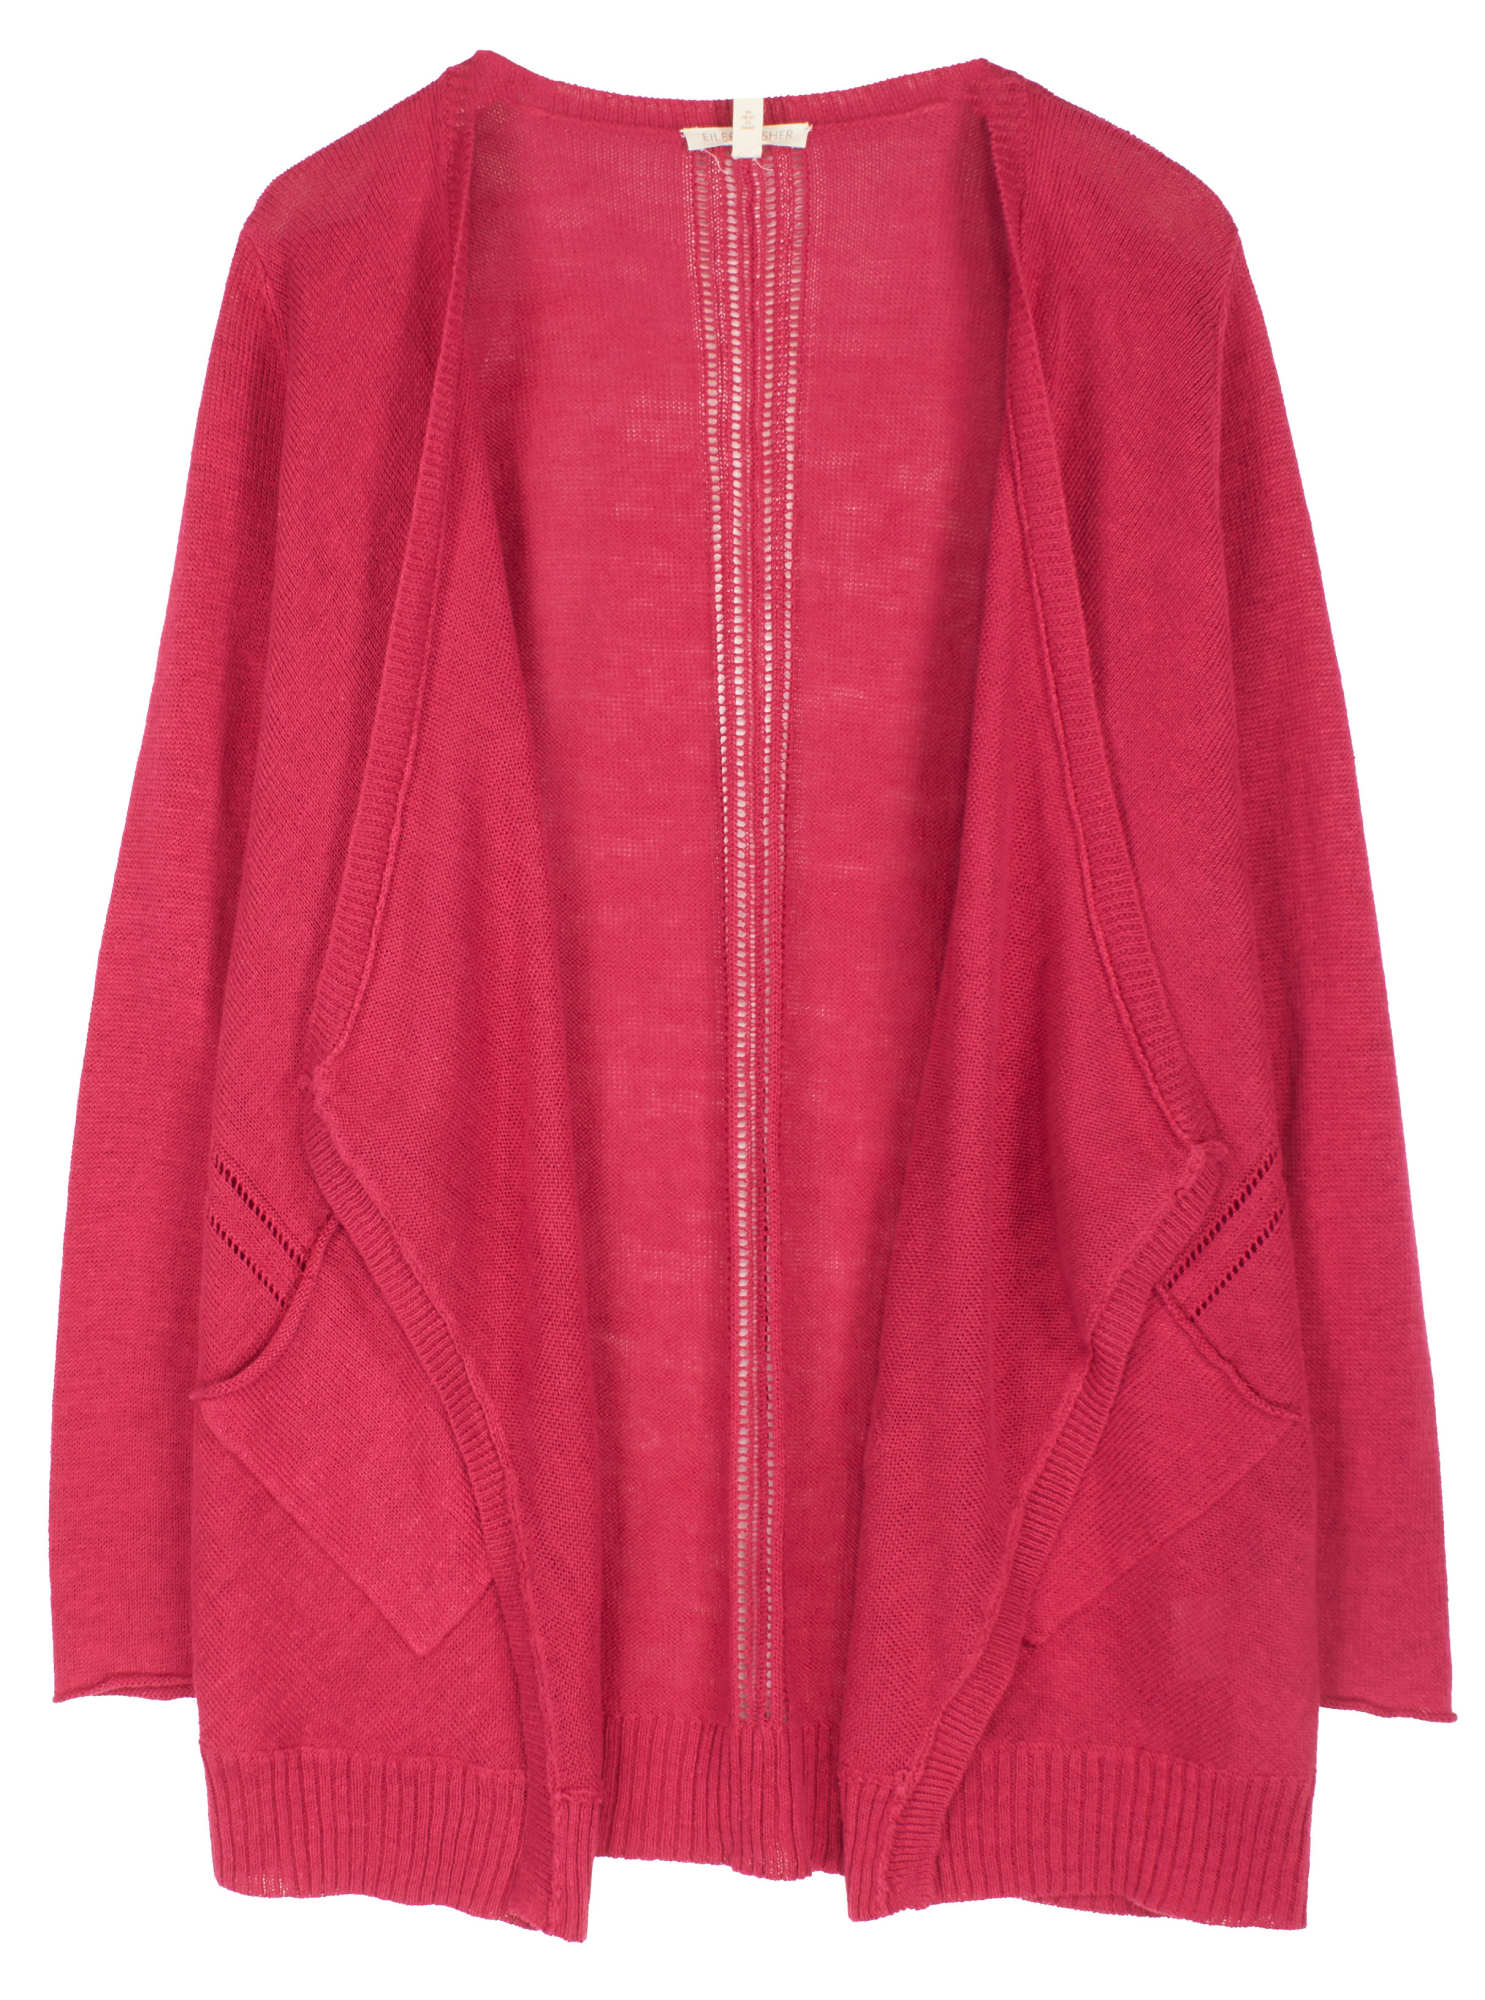 Organic Linen Knit Cardigan